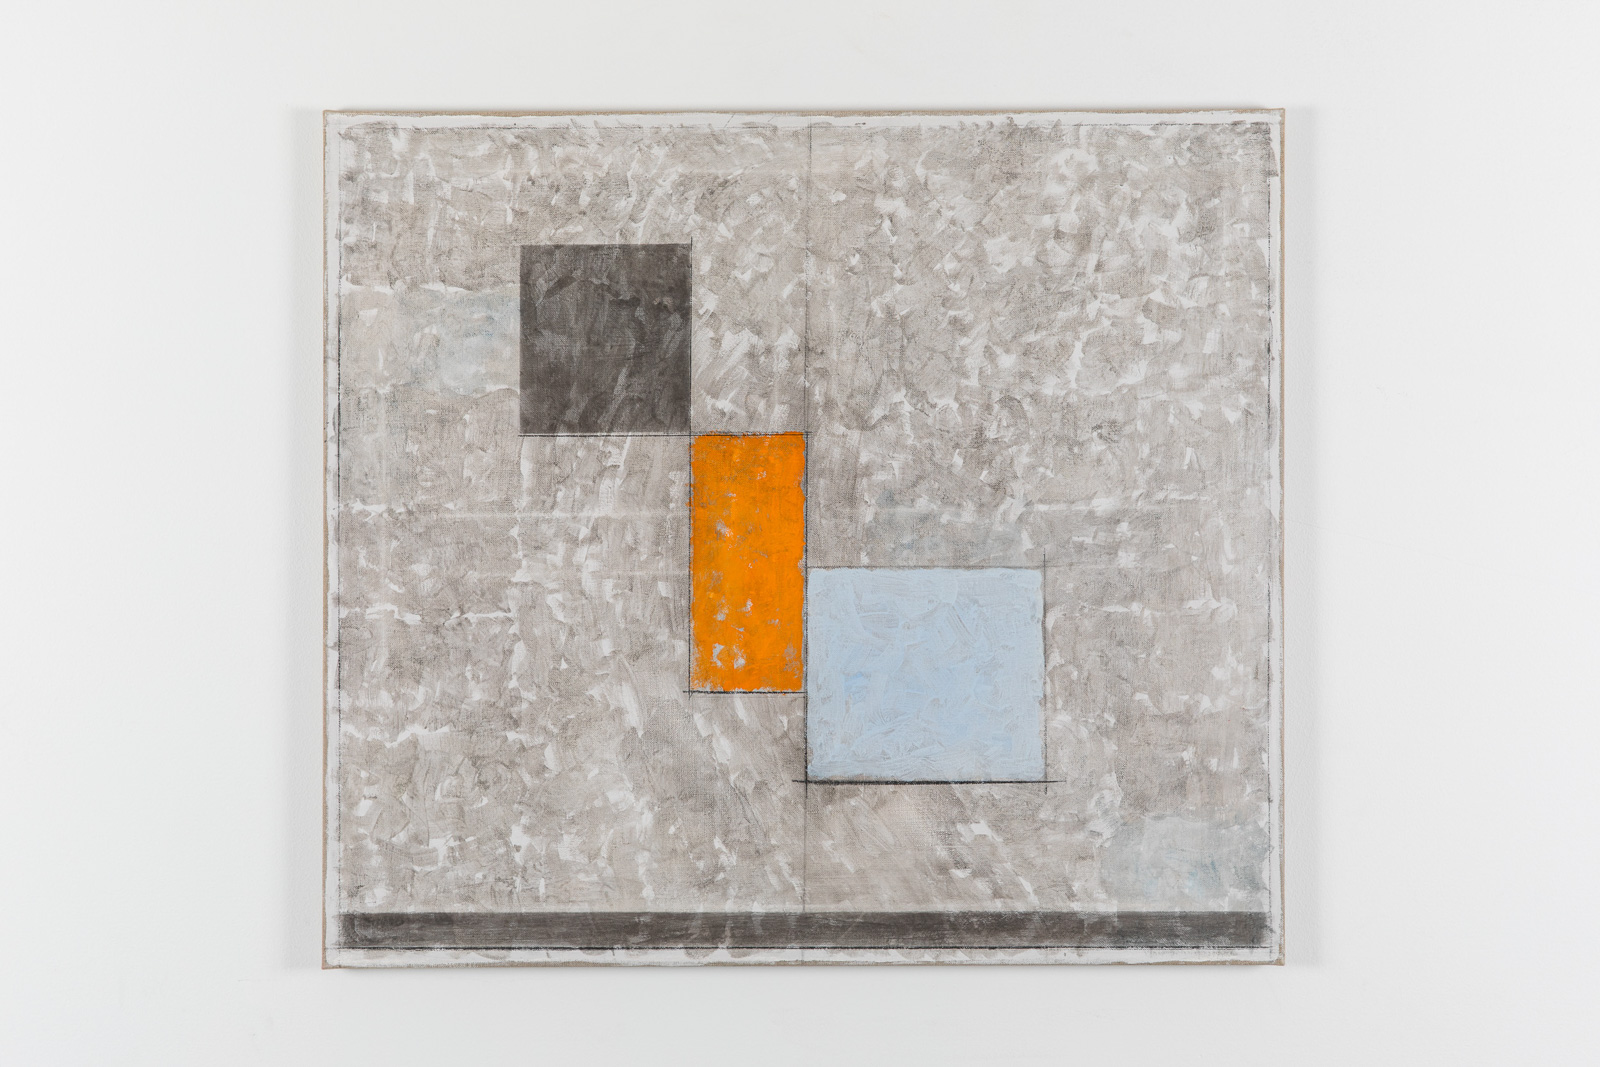 Vila Ziza 21, 2018, Egg tempera on canvas, 80 x 90 cm